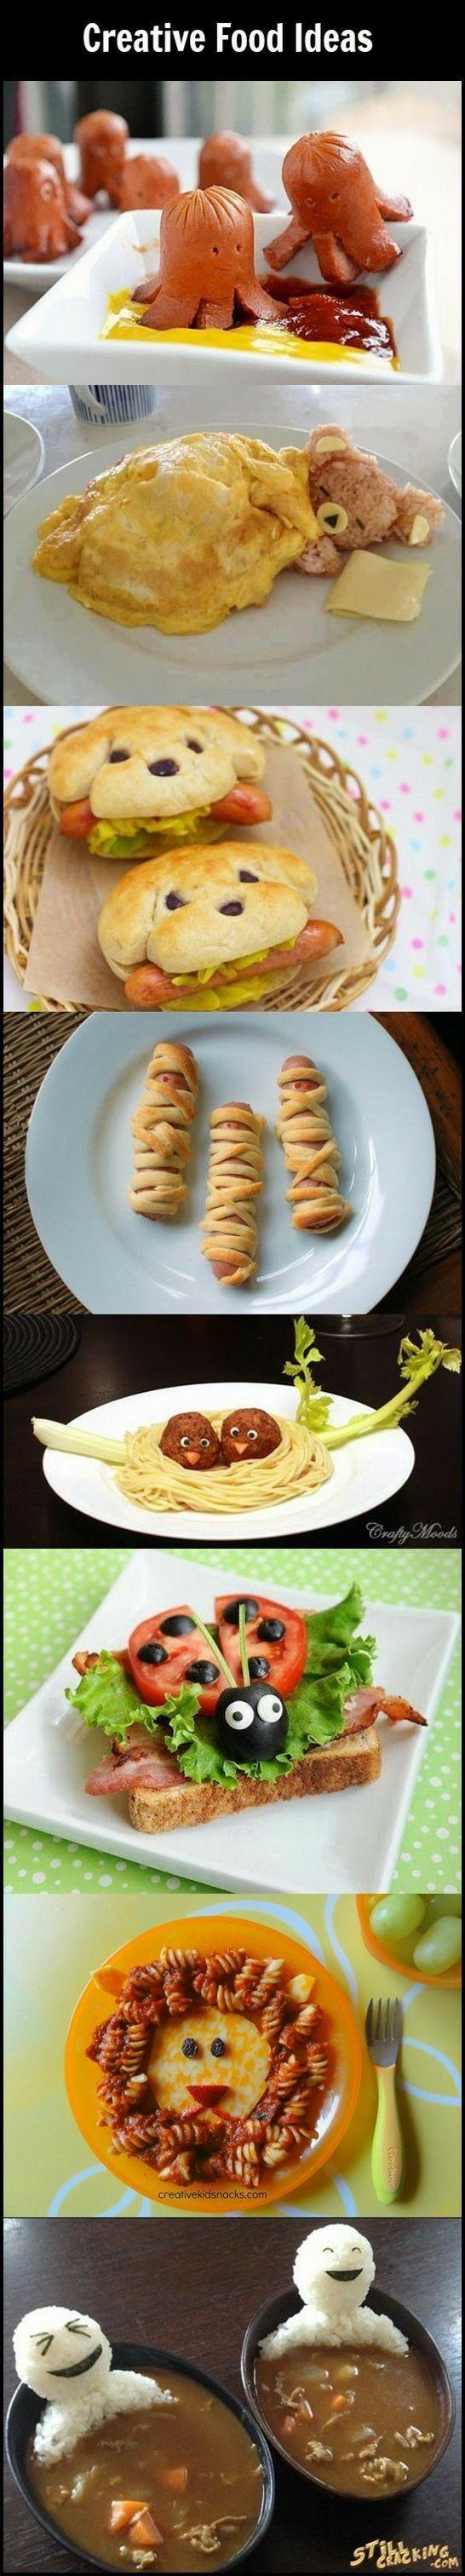 Pin by Анастасия Андреева on Anime Food   Food, Baby food recipes ...